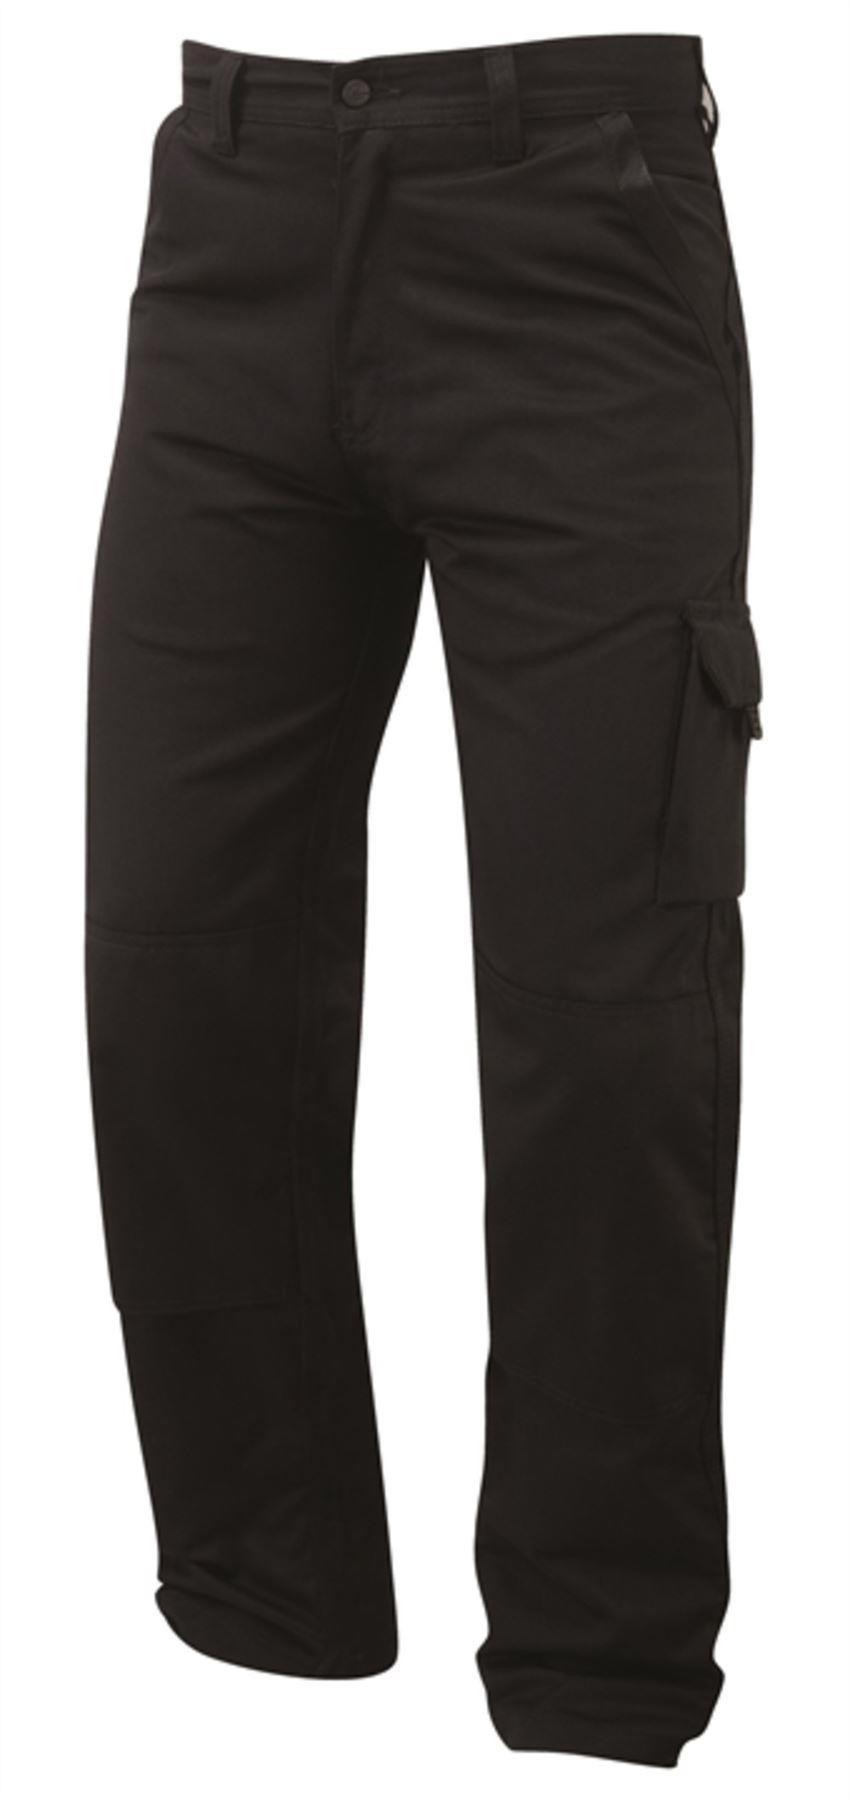 Orn Heron Kneepad Combat Trousers - Black|46W29L